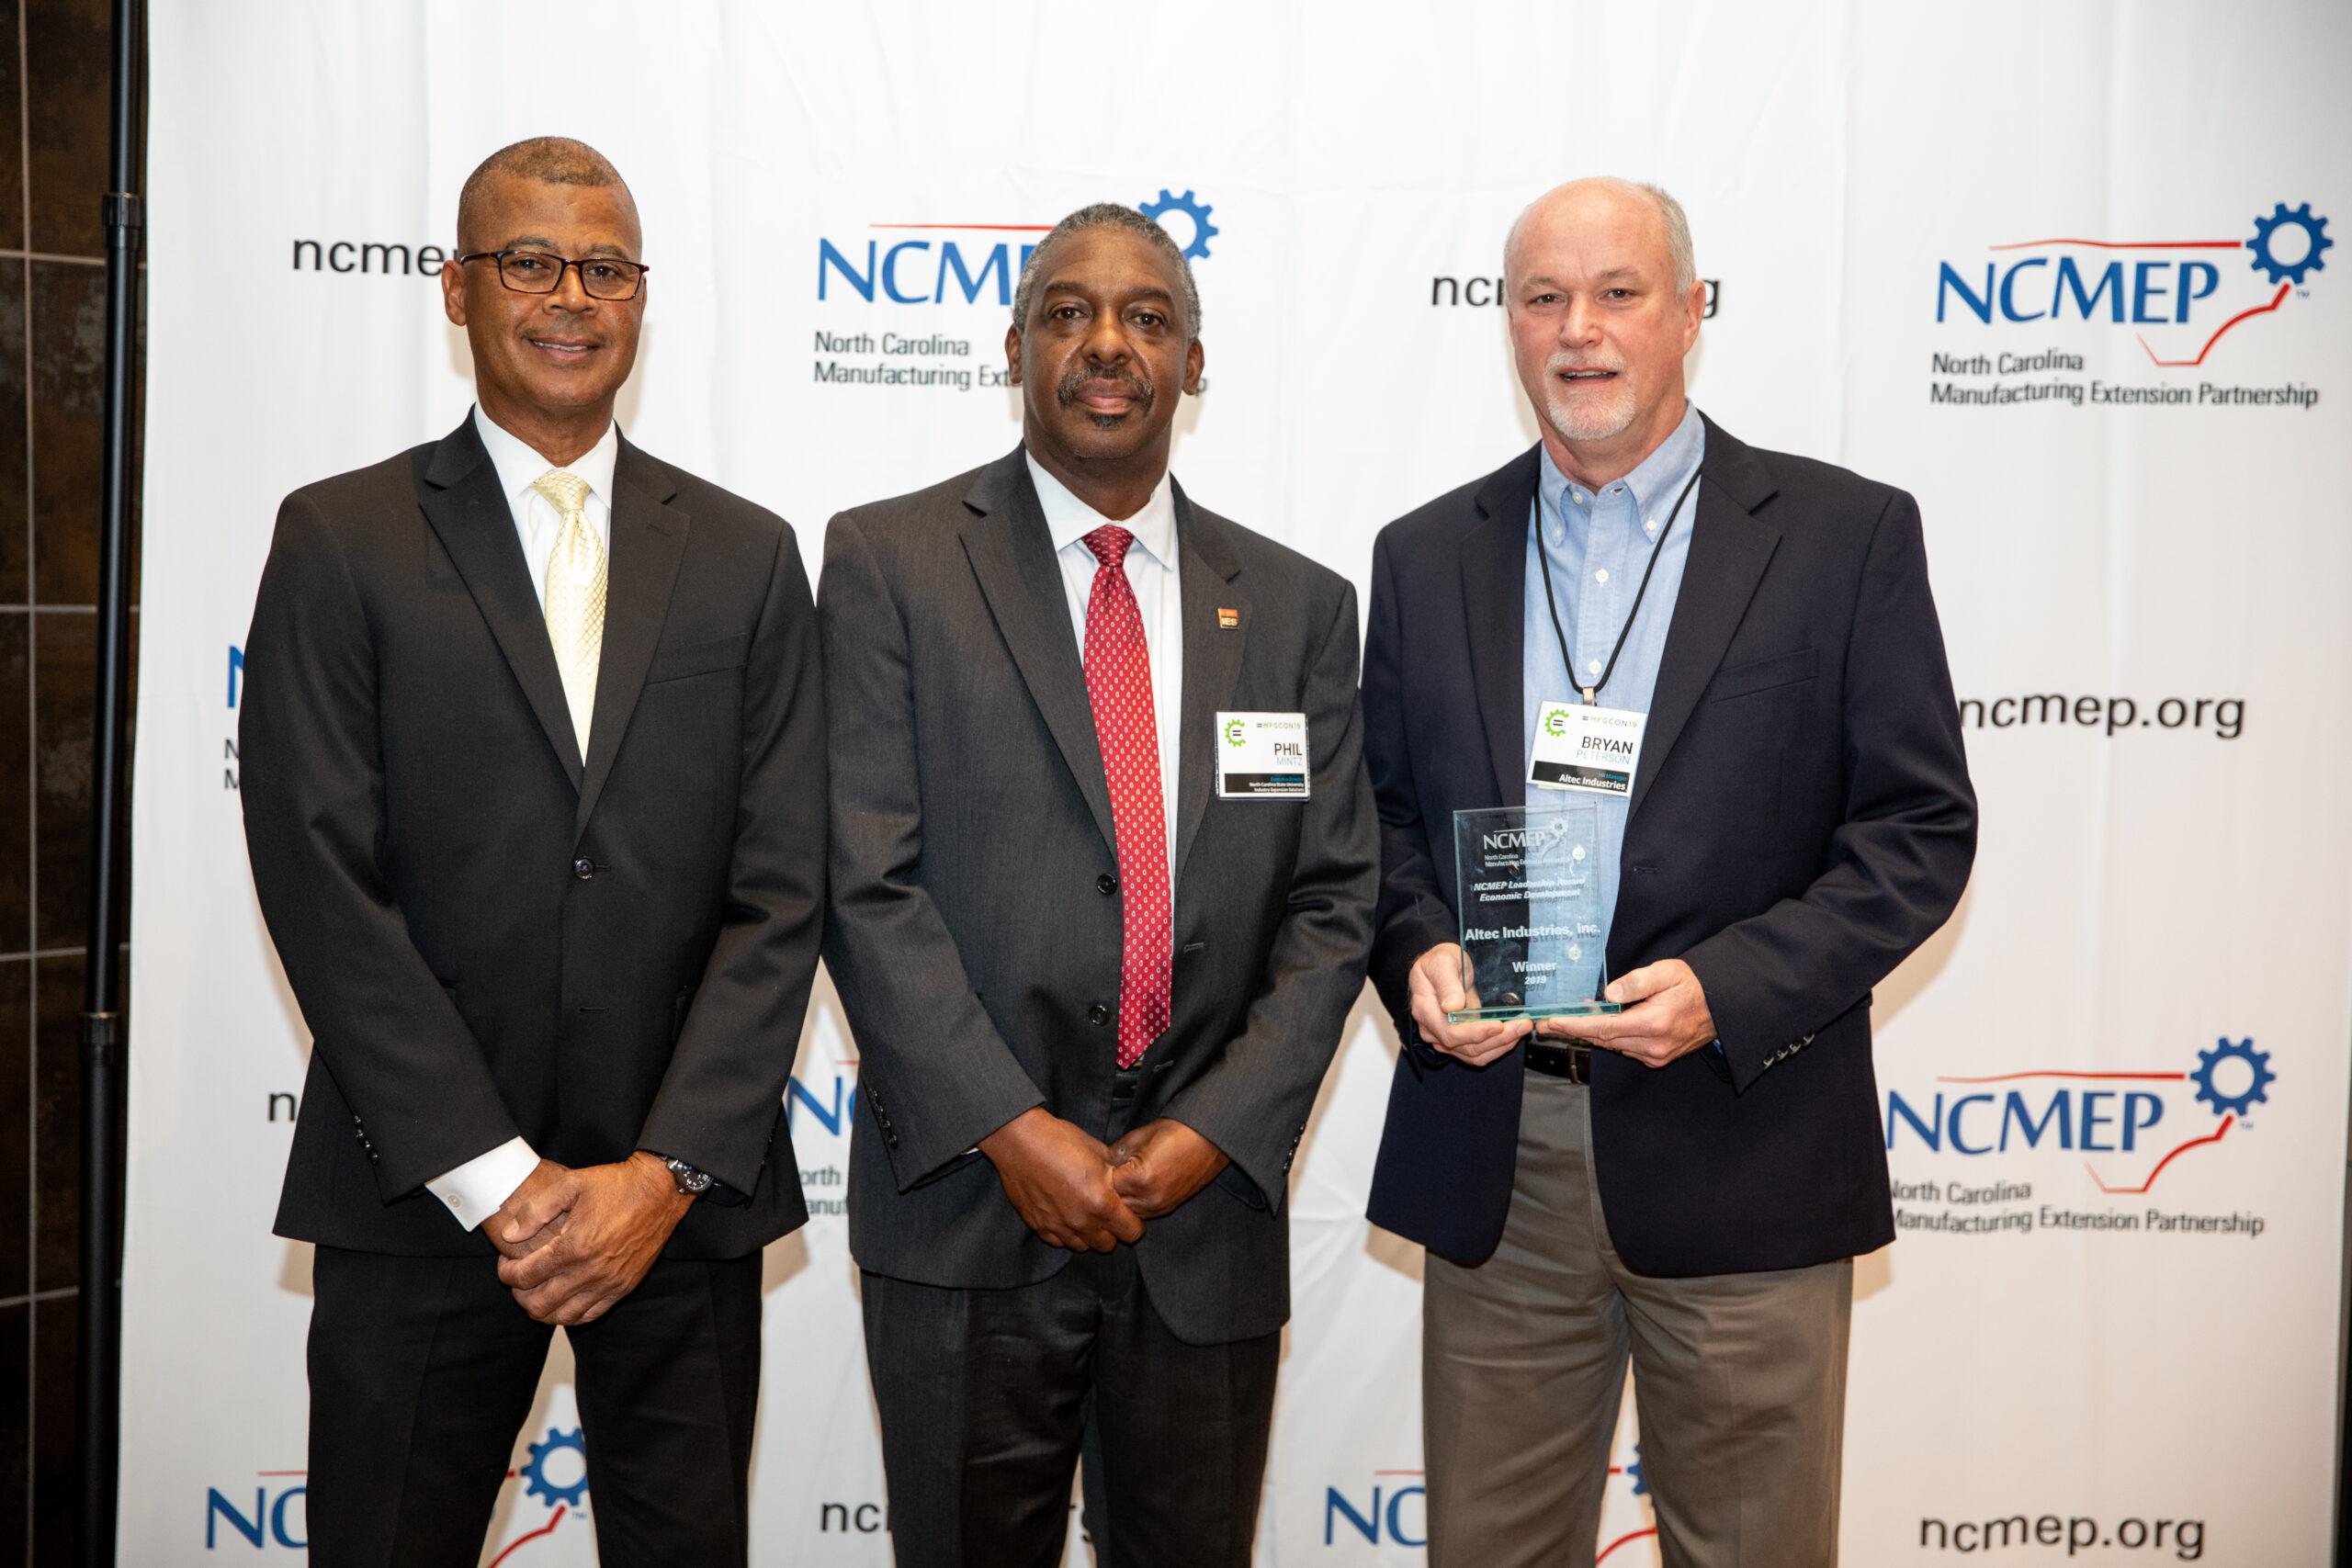 mfgCON19_Award-Winners-Altec Industries Inc Photo